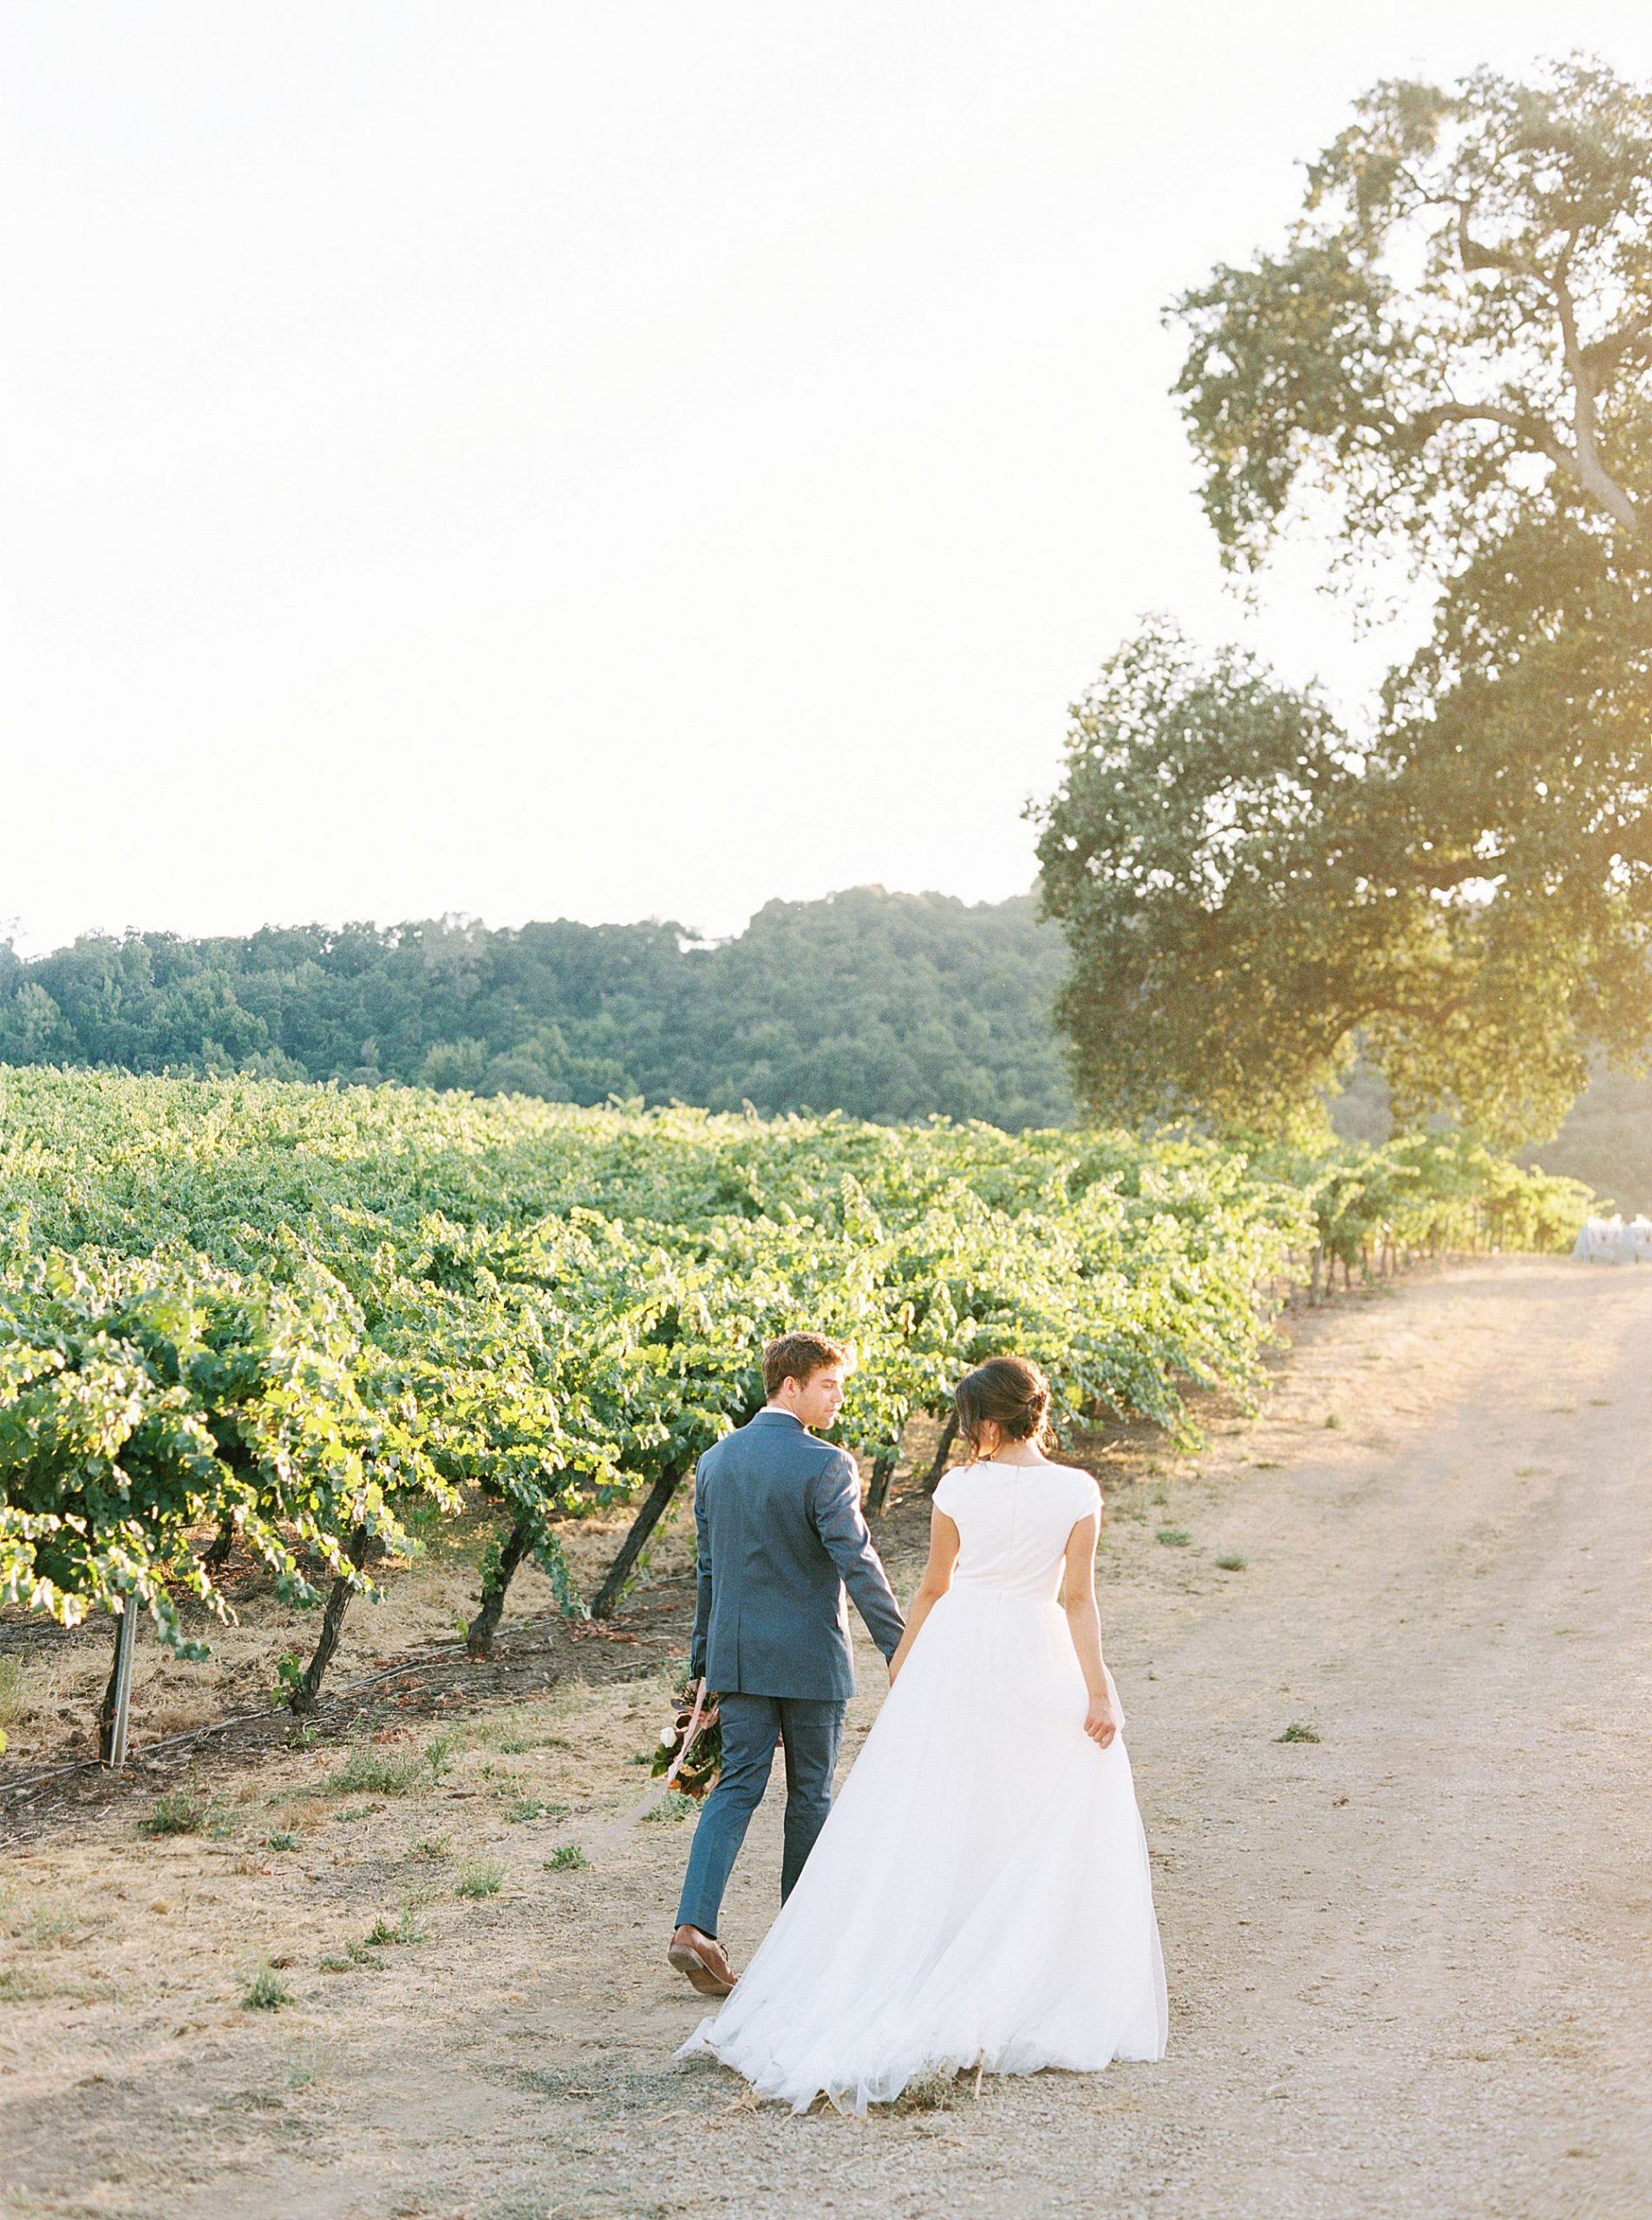 HammerSky Wedding Inspiration Featured on Hey Wedding Lady with Vanessa Noel Events - Ashley Baumgartner - SLO Wedding Photographer_0006.jpg